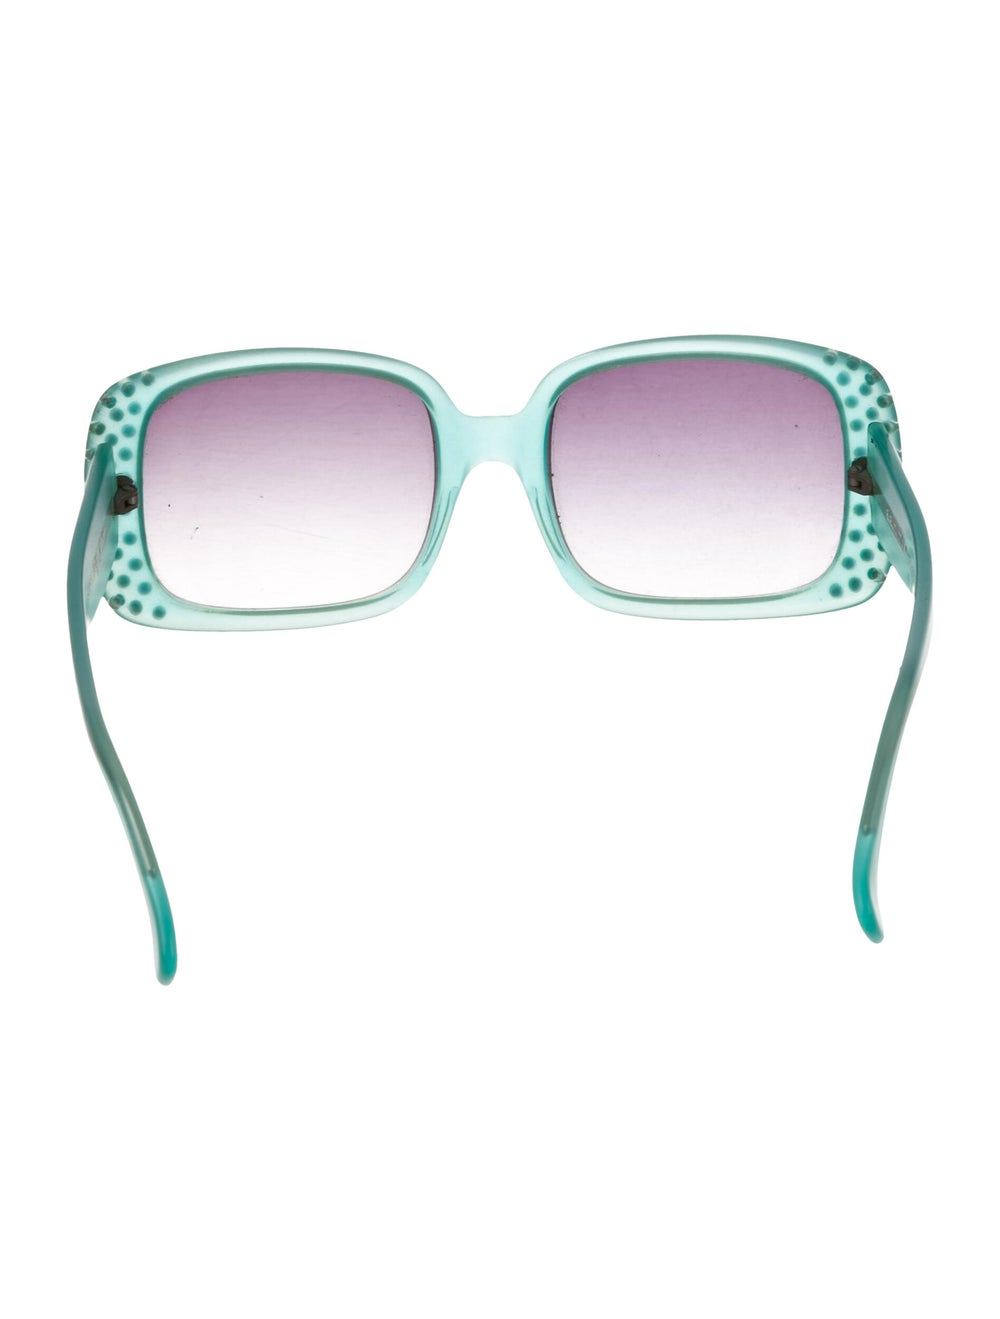 Alain Mikli Oversize Tinted Sunglasses Green - image 3